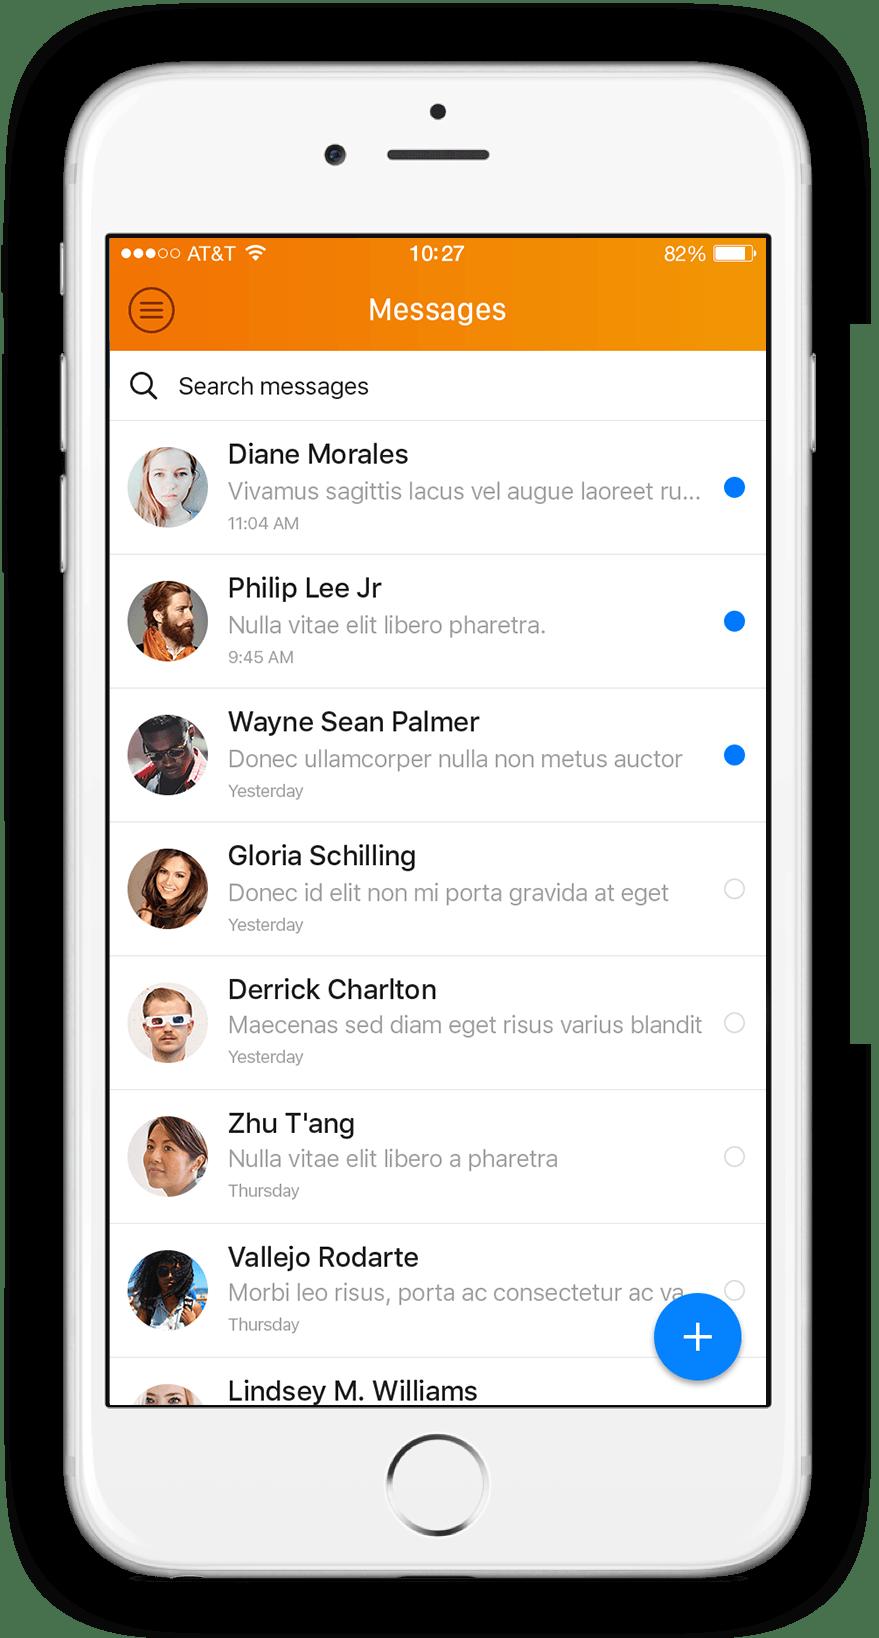 Virtuagym personal trainer app messenger